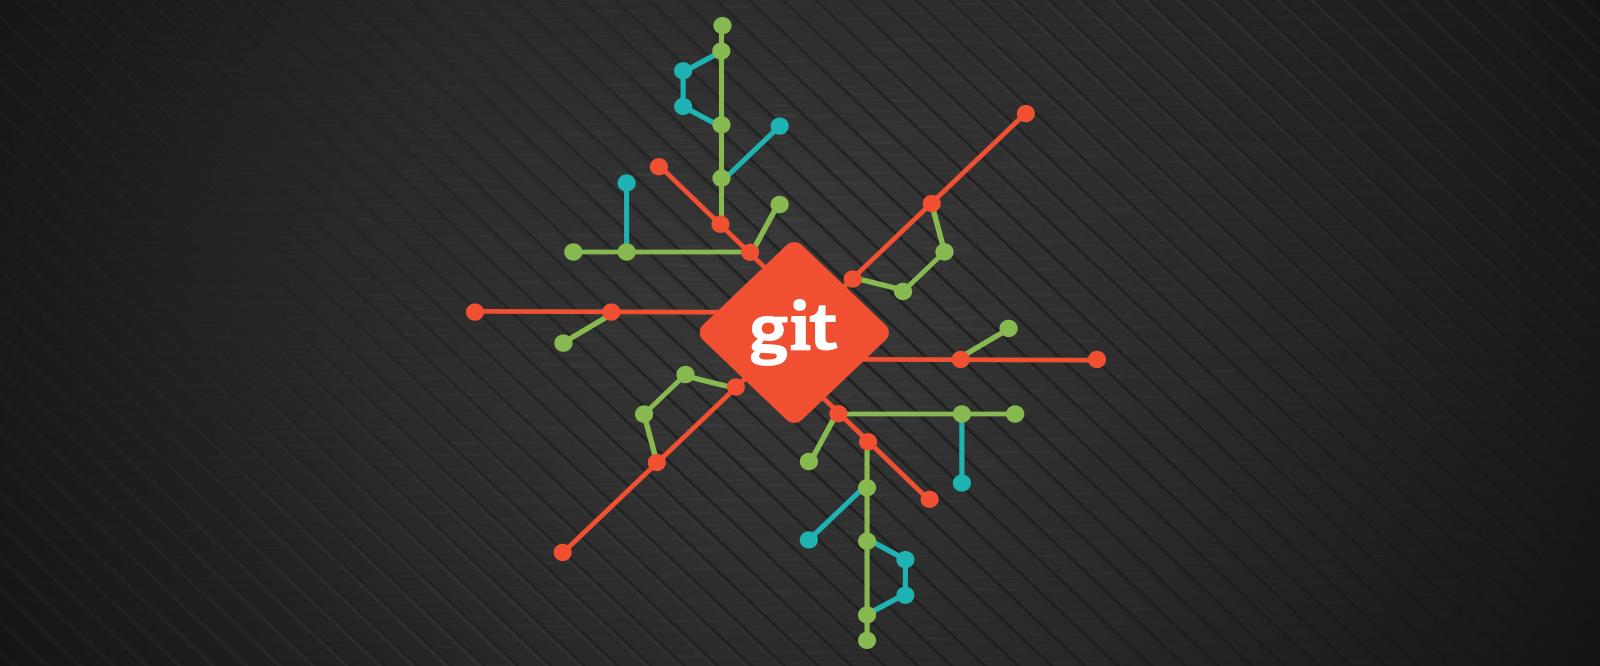 Versionando código con Git